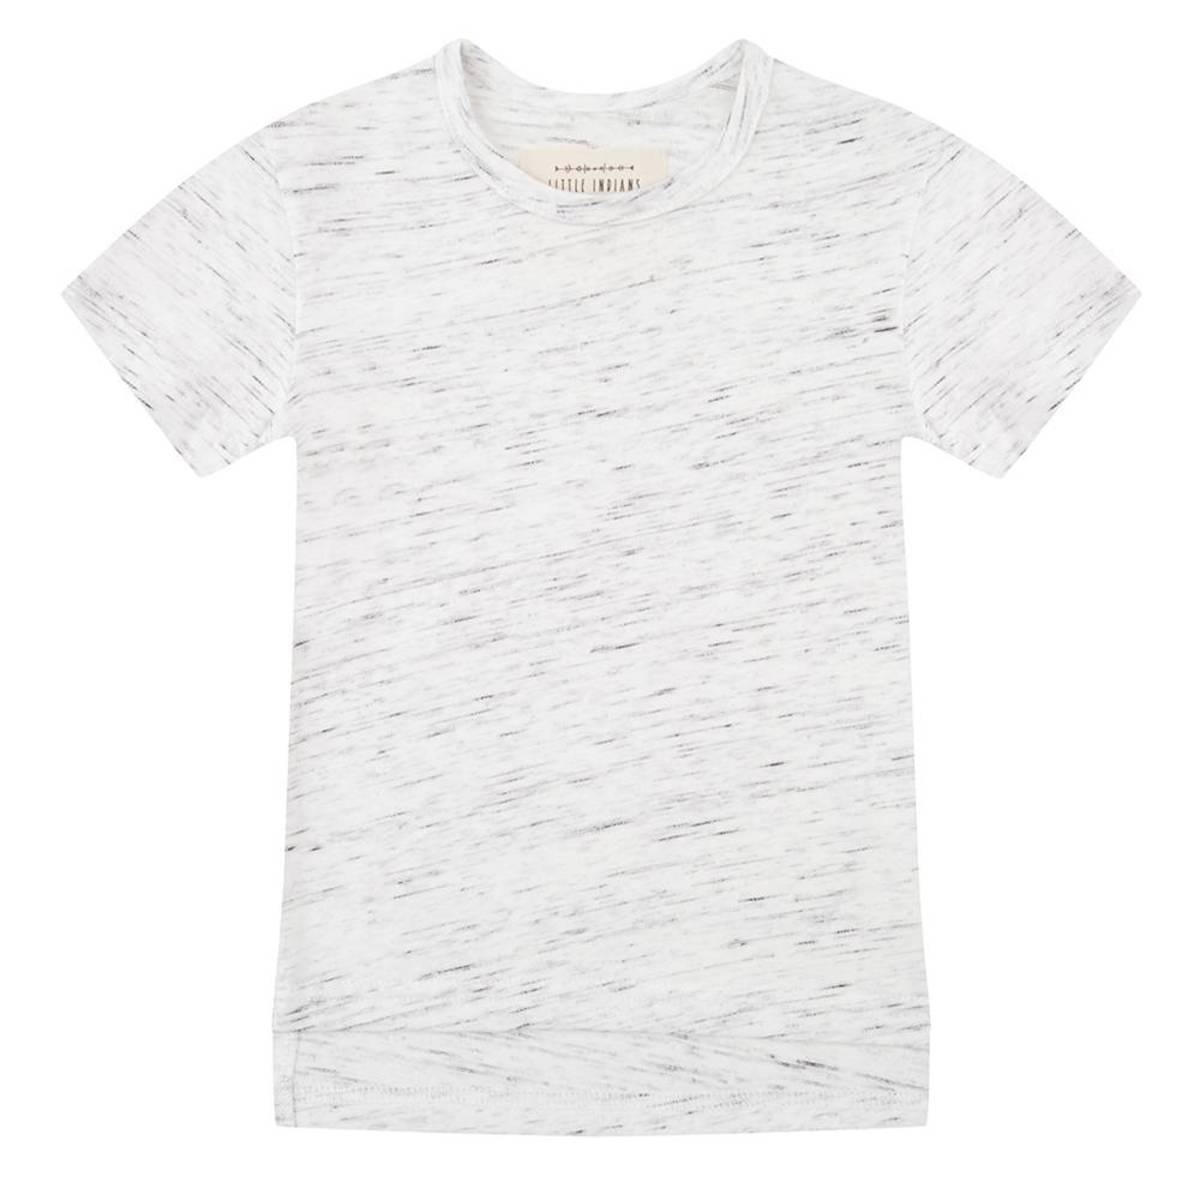 Hauts bébé Tee-Shirt manches courtes Marmer Gris - 3/4 ans Tee-Shirt manches courtes Marmer Gris - 3/4 ans